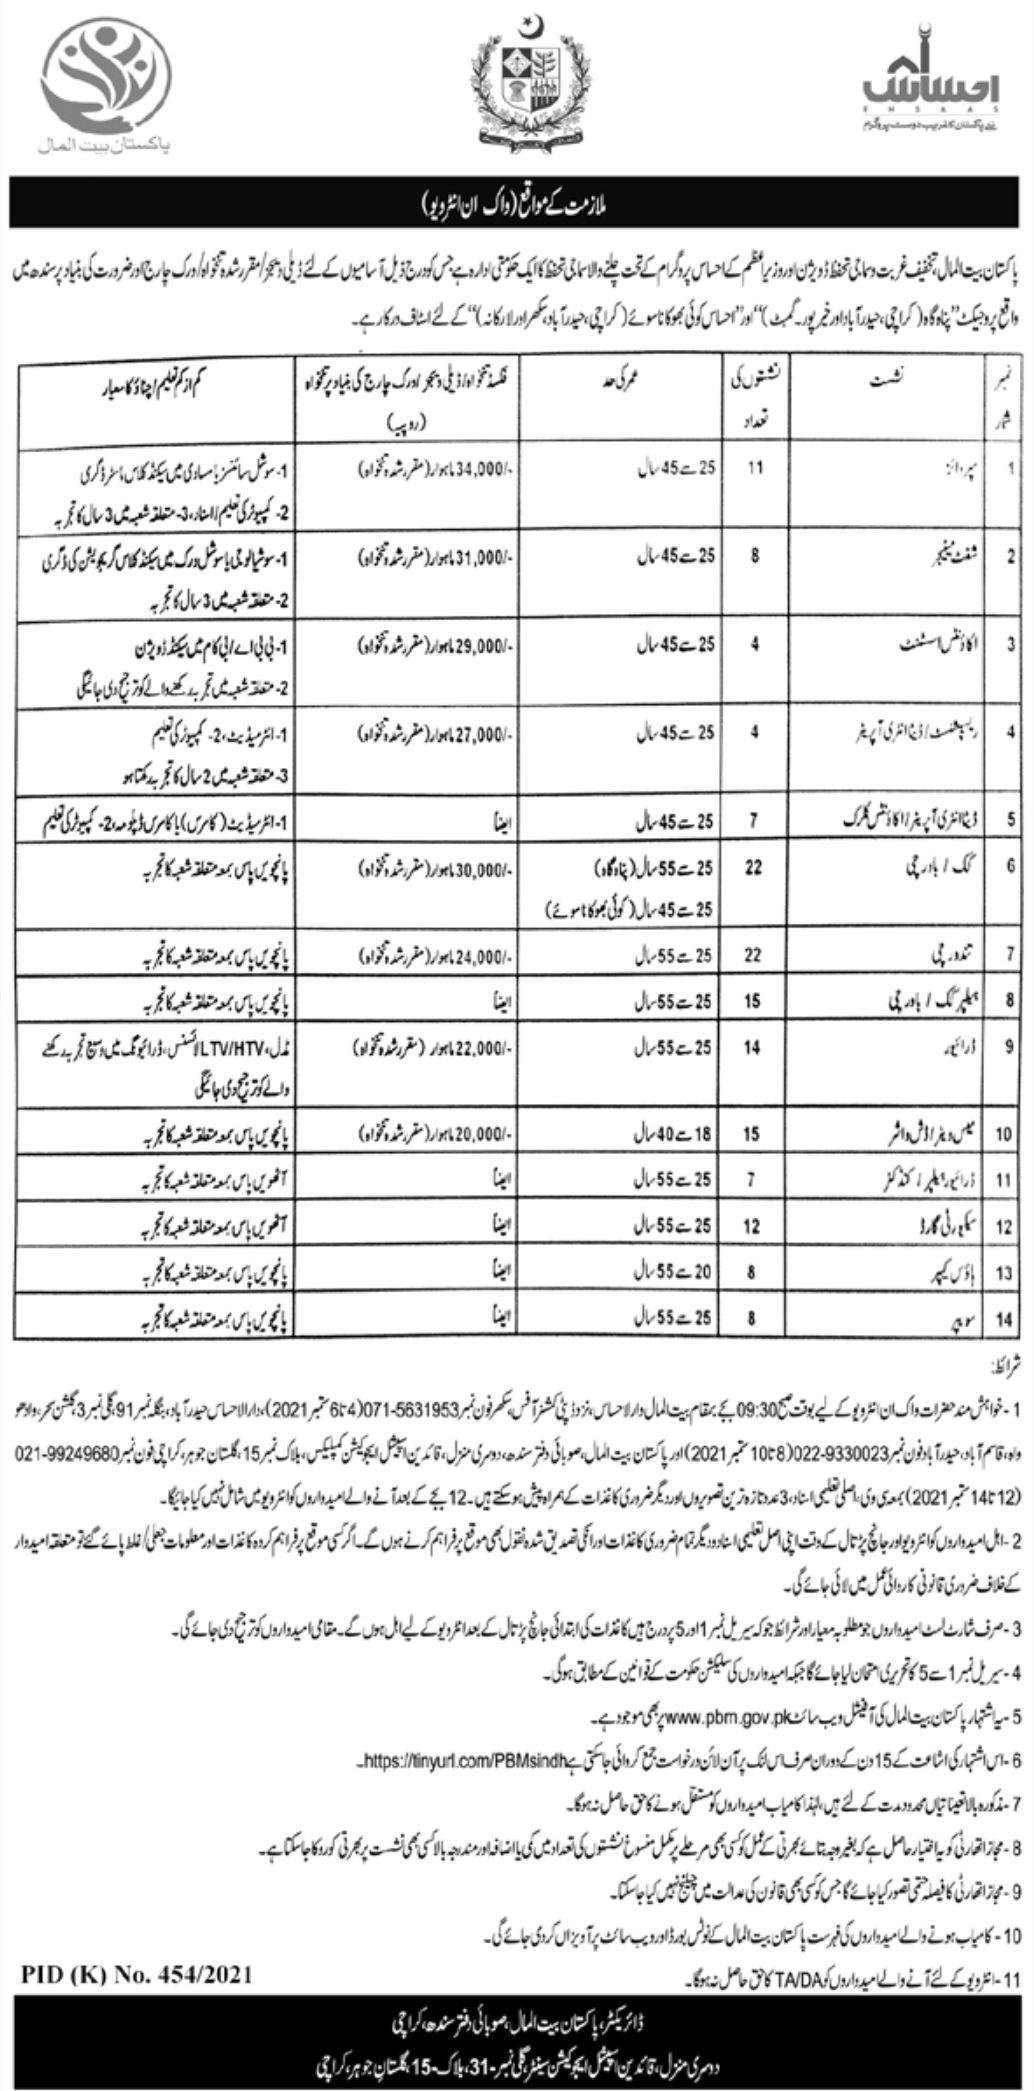 Pakistan Bait ul Mal Vacancies 2021 2